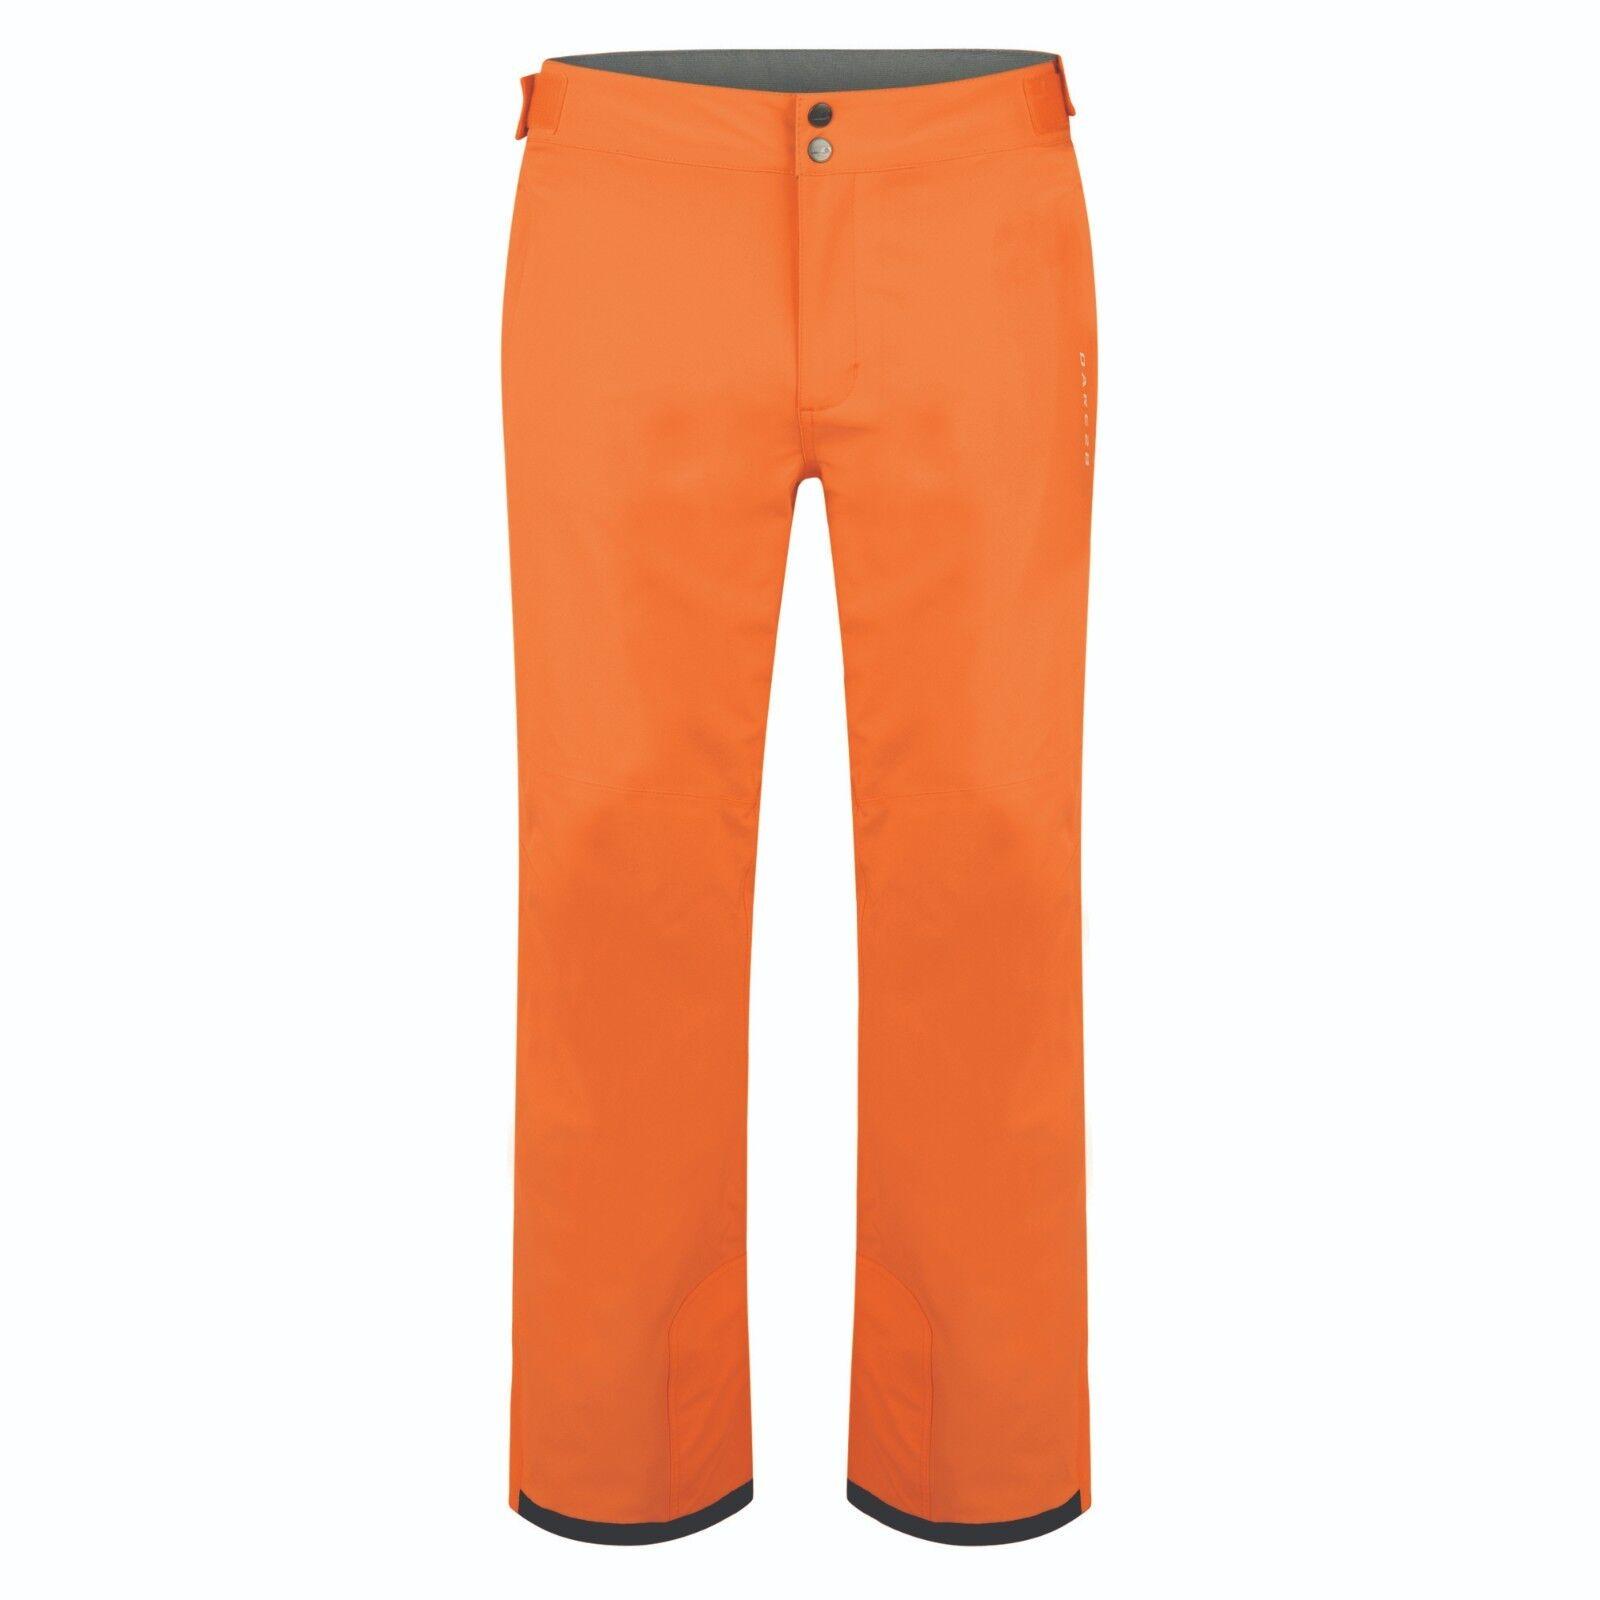 DARE 2B CERTIFY II SKI PANTS SALOPETTES WATERPROOF VIBRANT orange SHORT LEG